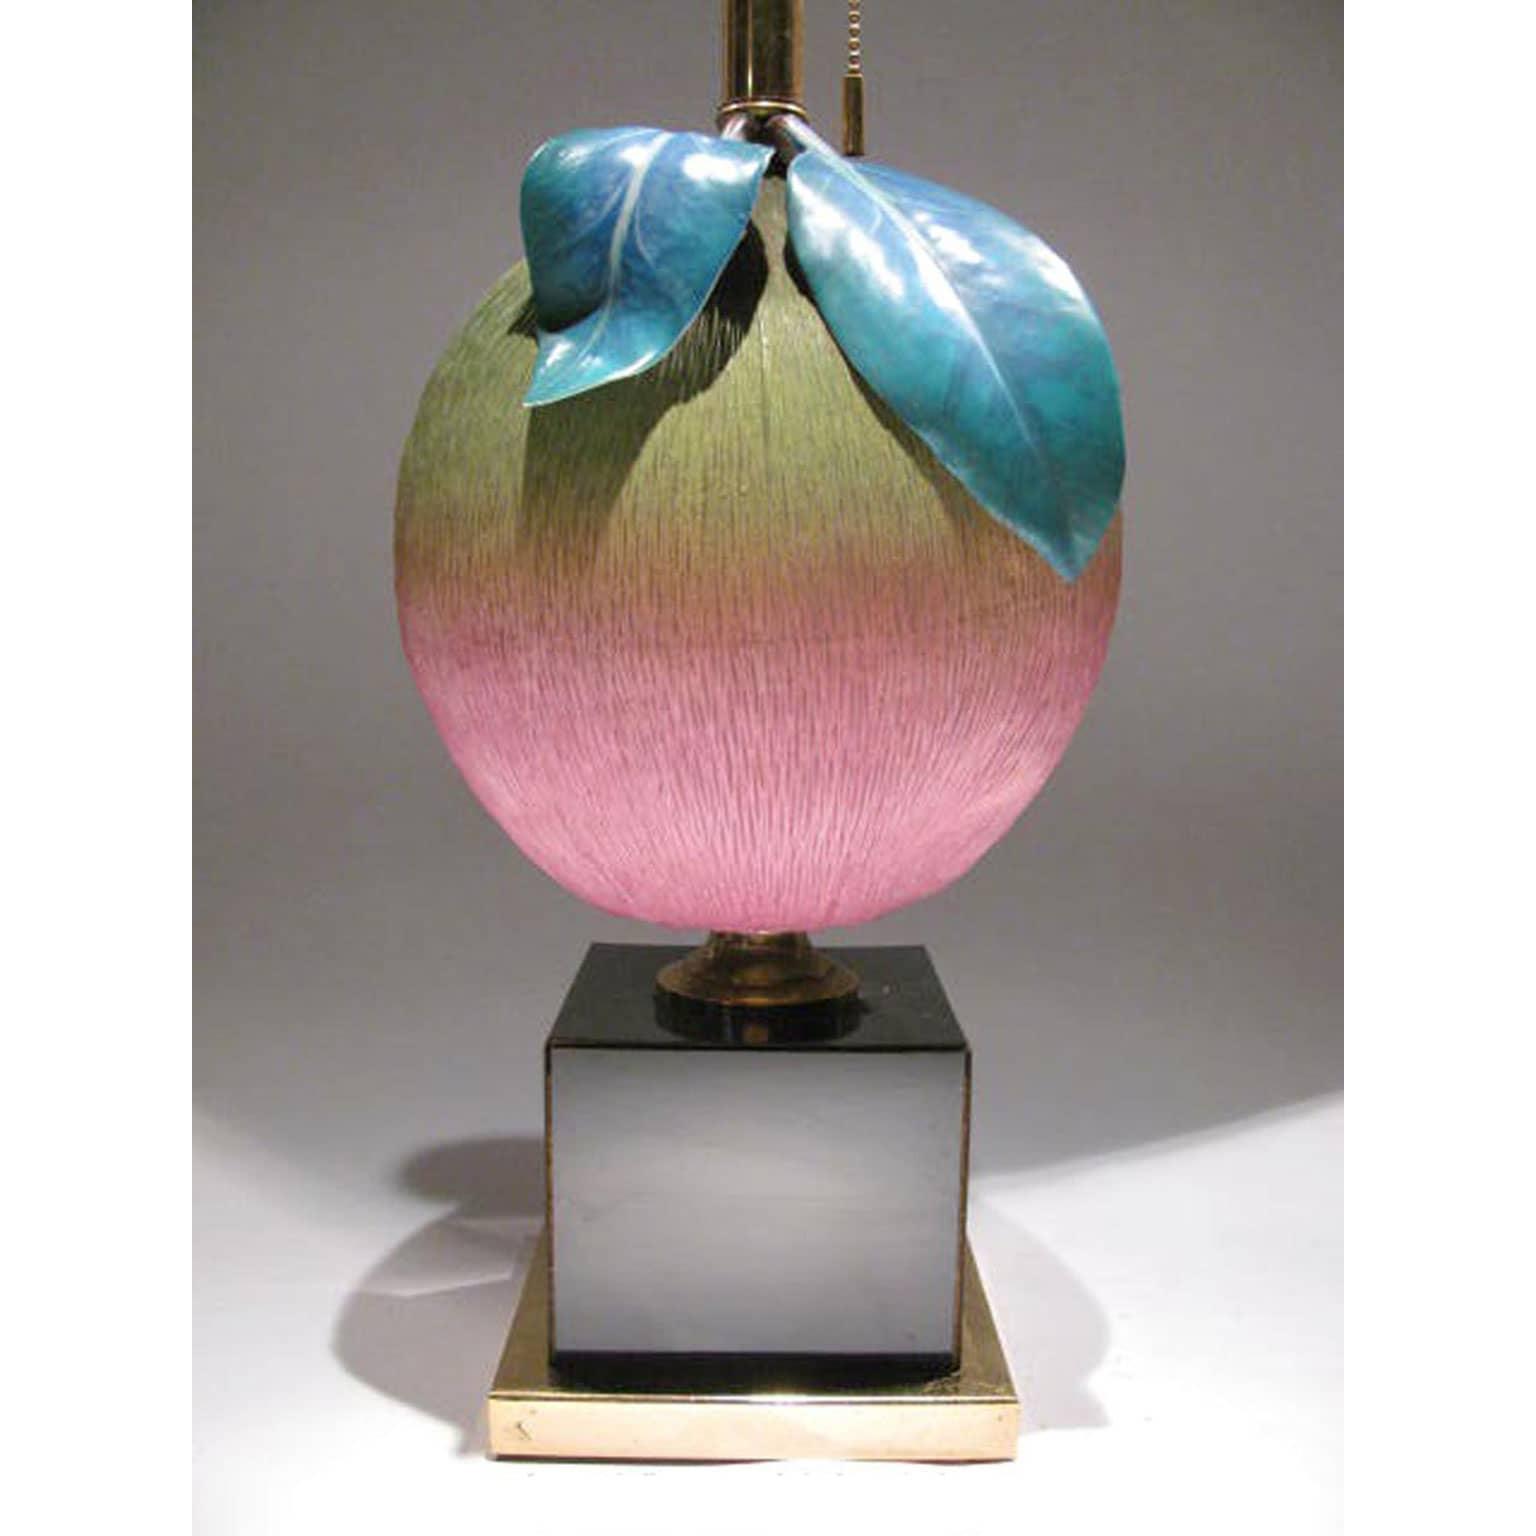 lampada-porcellana-decorata-mangani-anni-70-2287